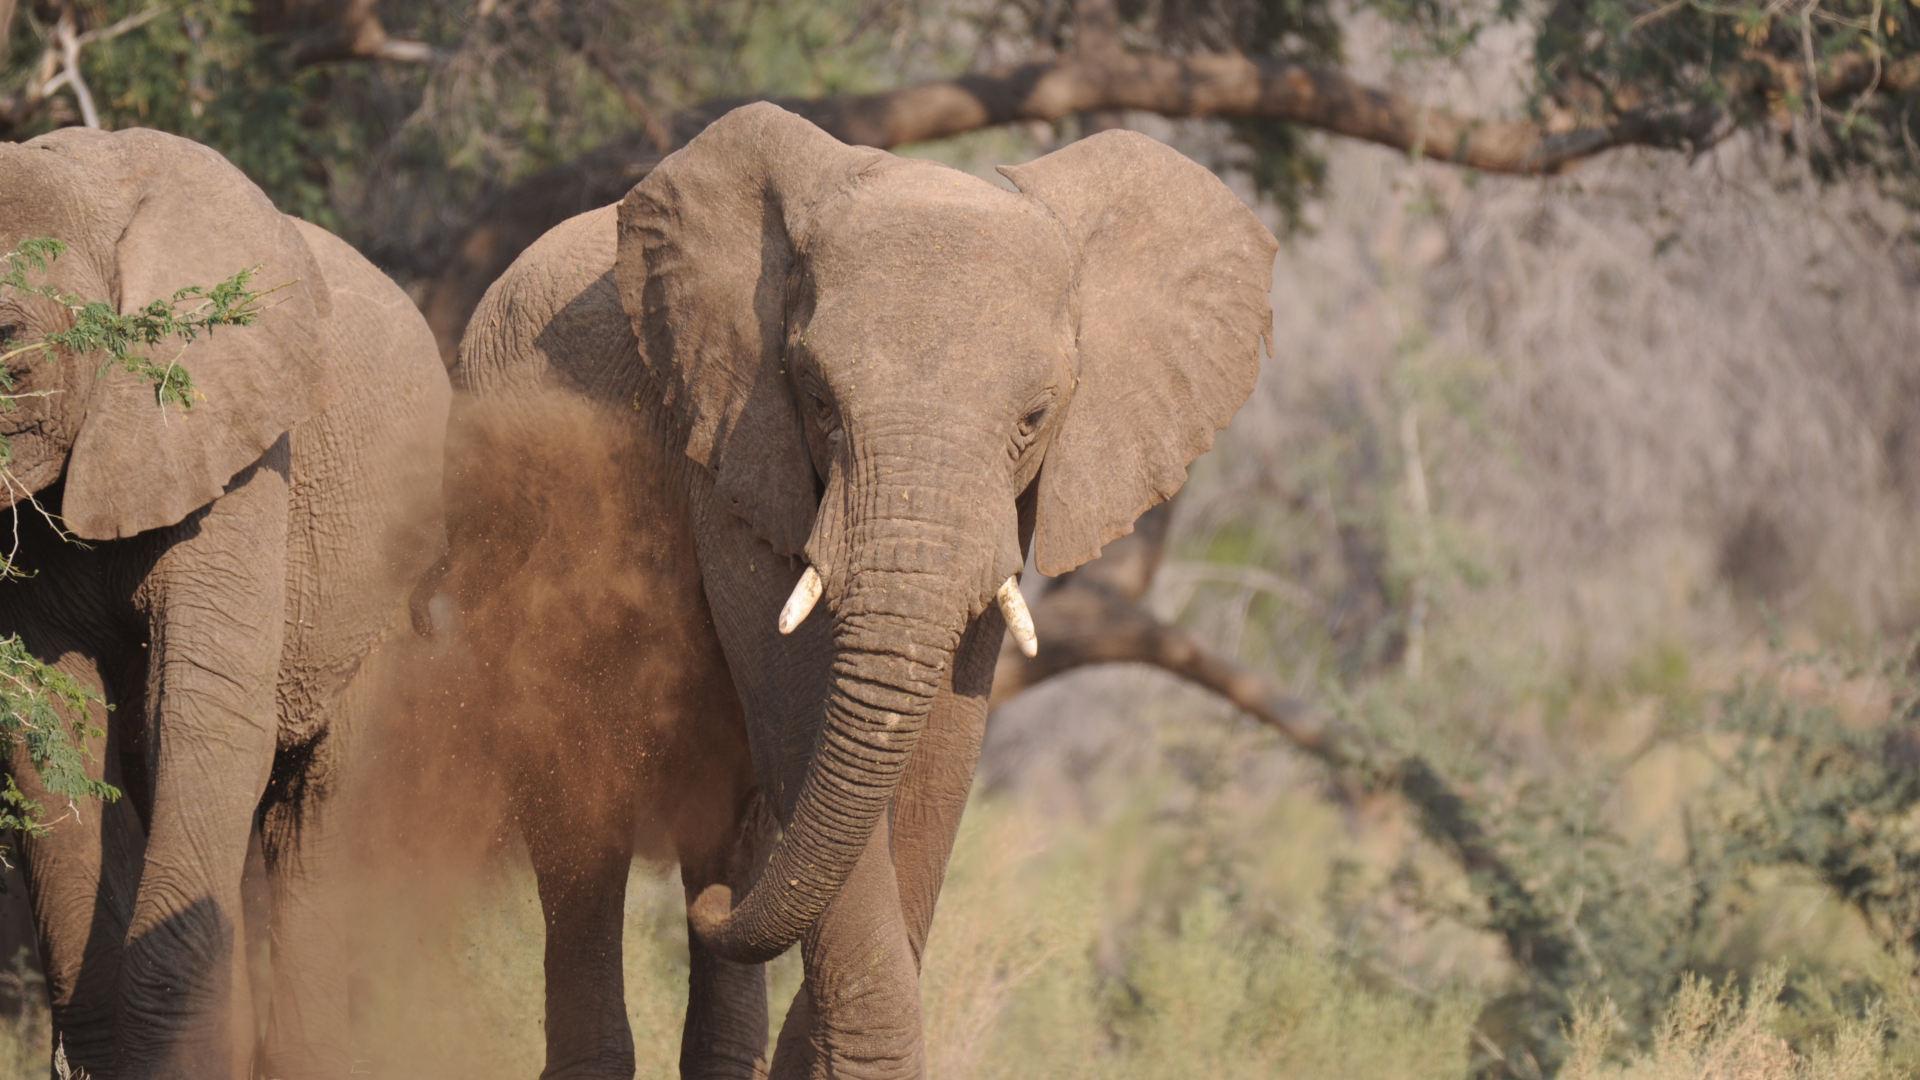 Elephant puttign dust on himself